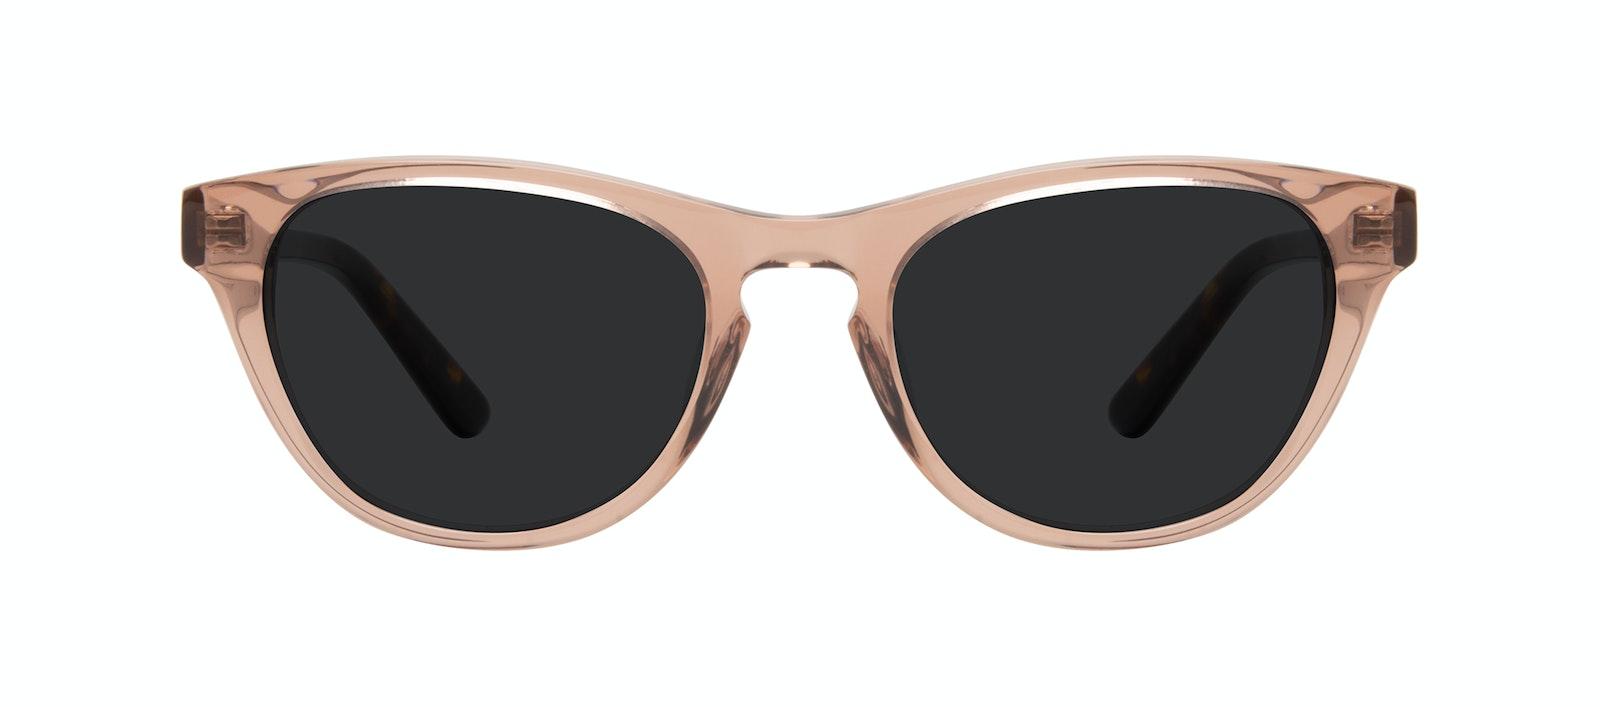 Affordable Fashion Glasses Cat Eye Sunglasses Women Selfie Rose Front